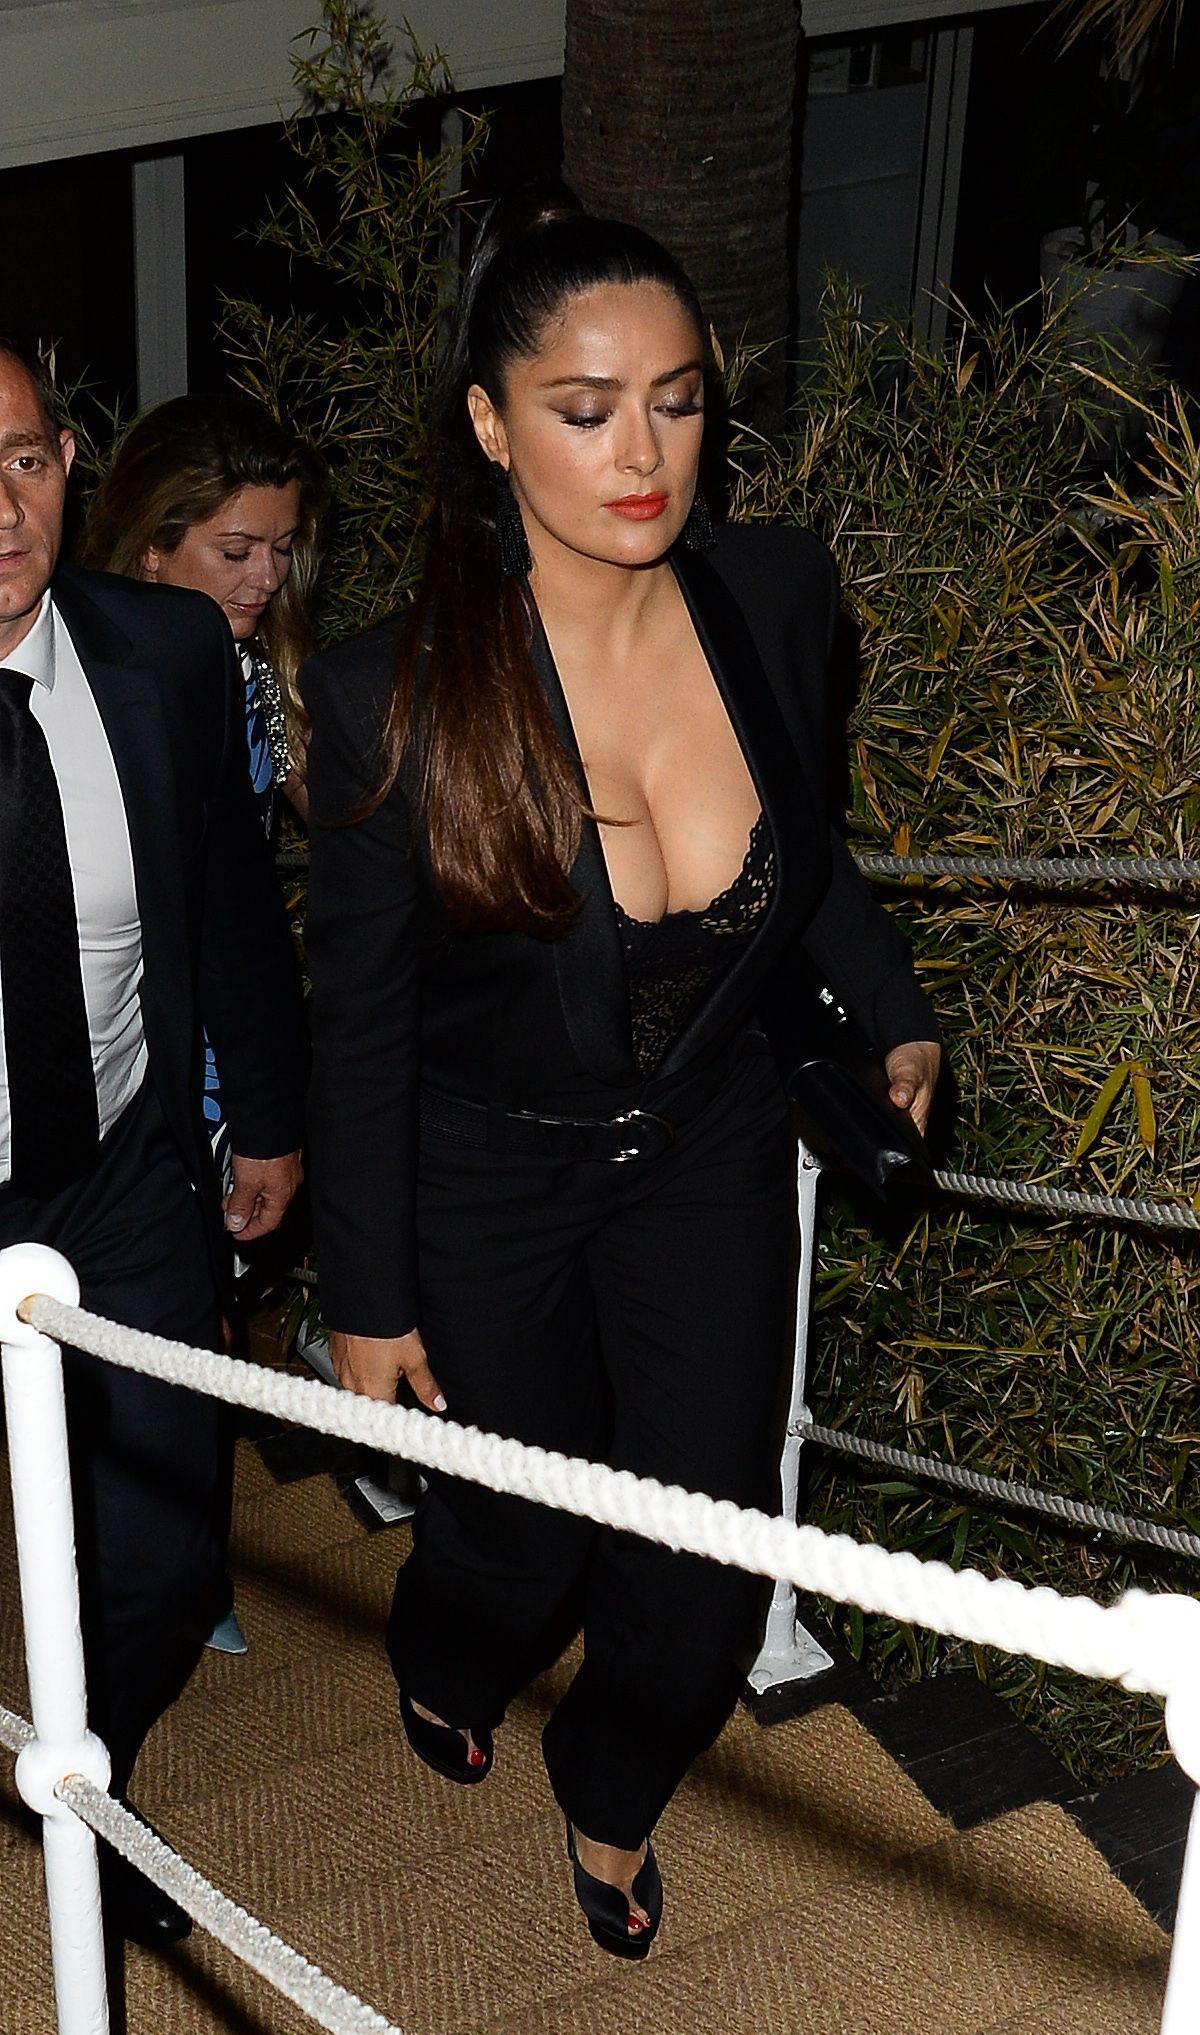 Cleavage Mimi Gutierrez nudes (72 photo), Tits, Hot, Selfie, cleavage 2020